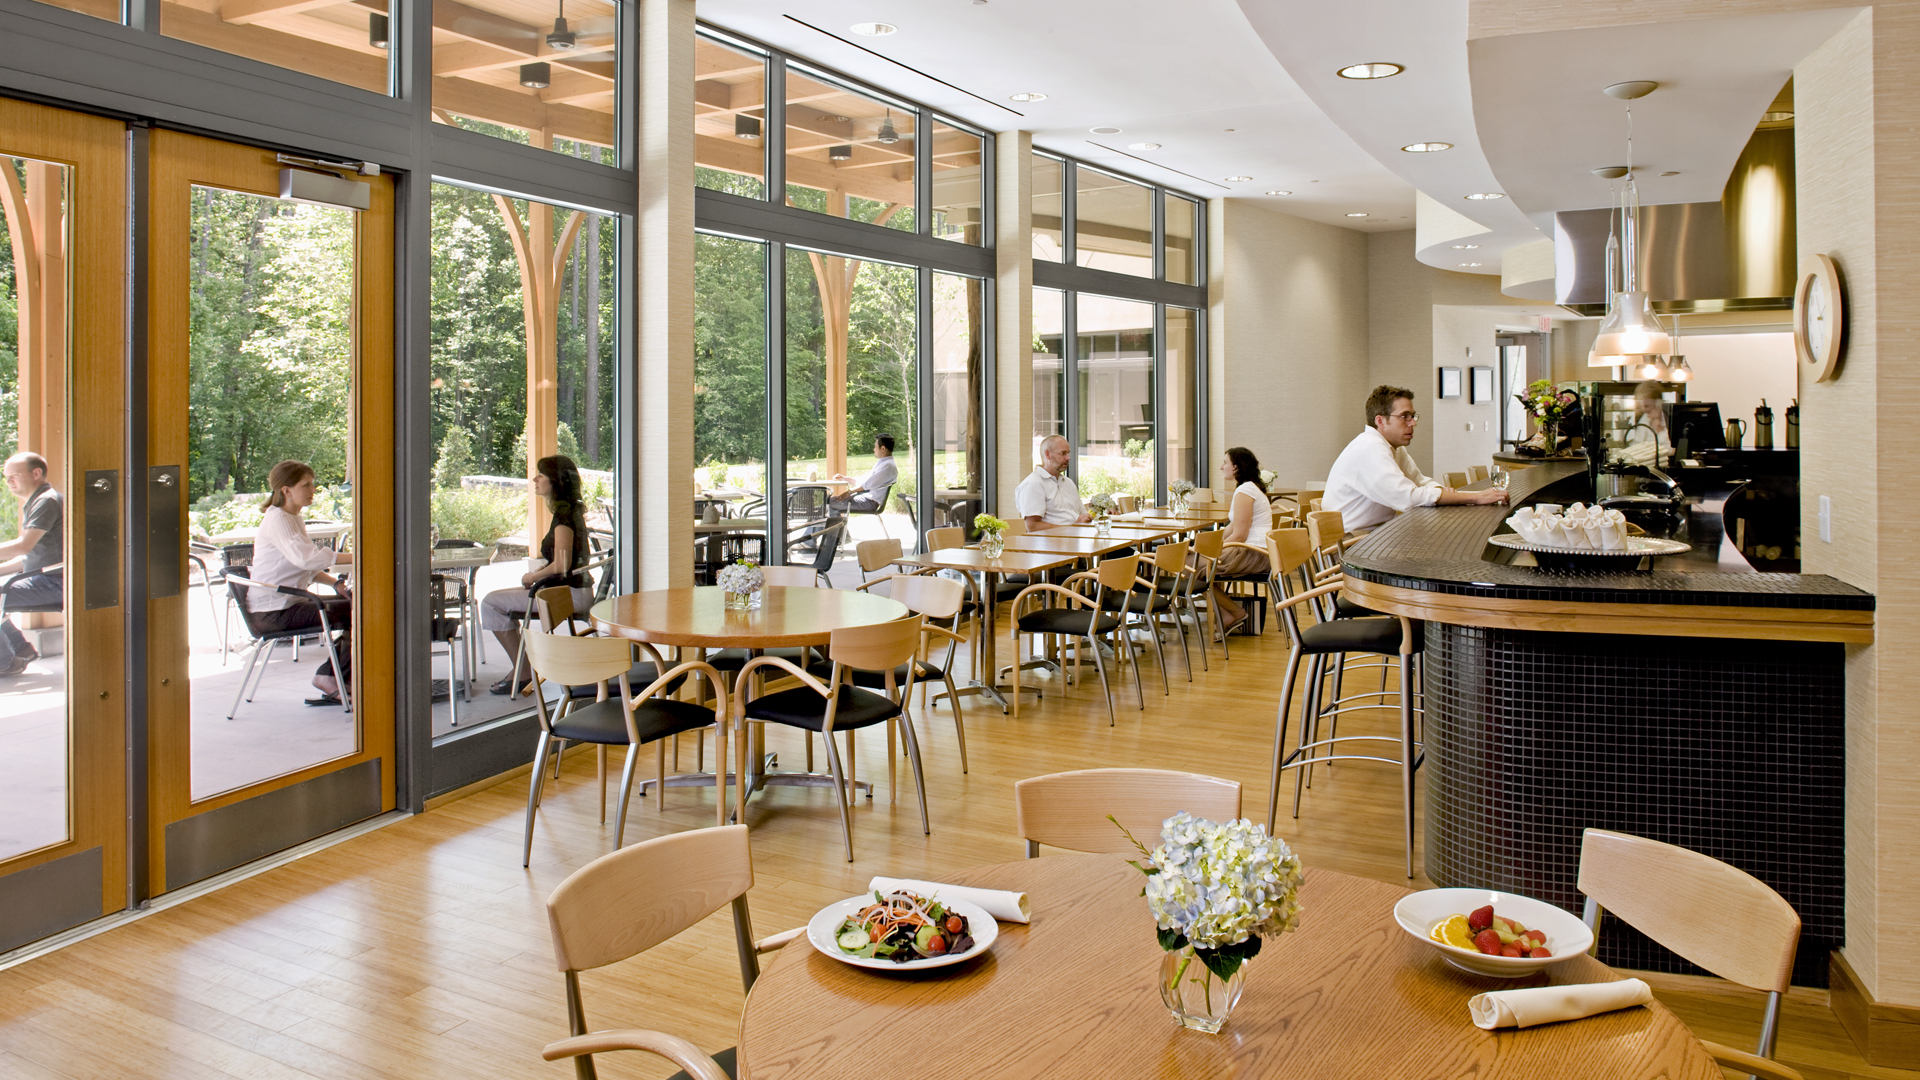 The Integrative Cafe